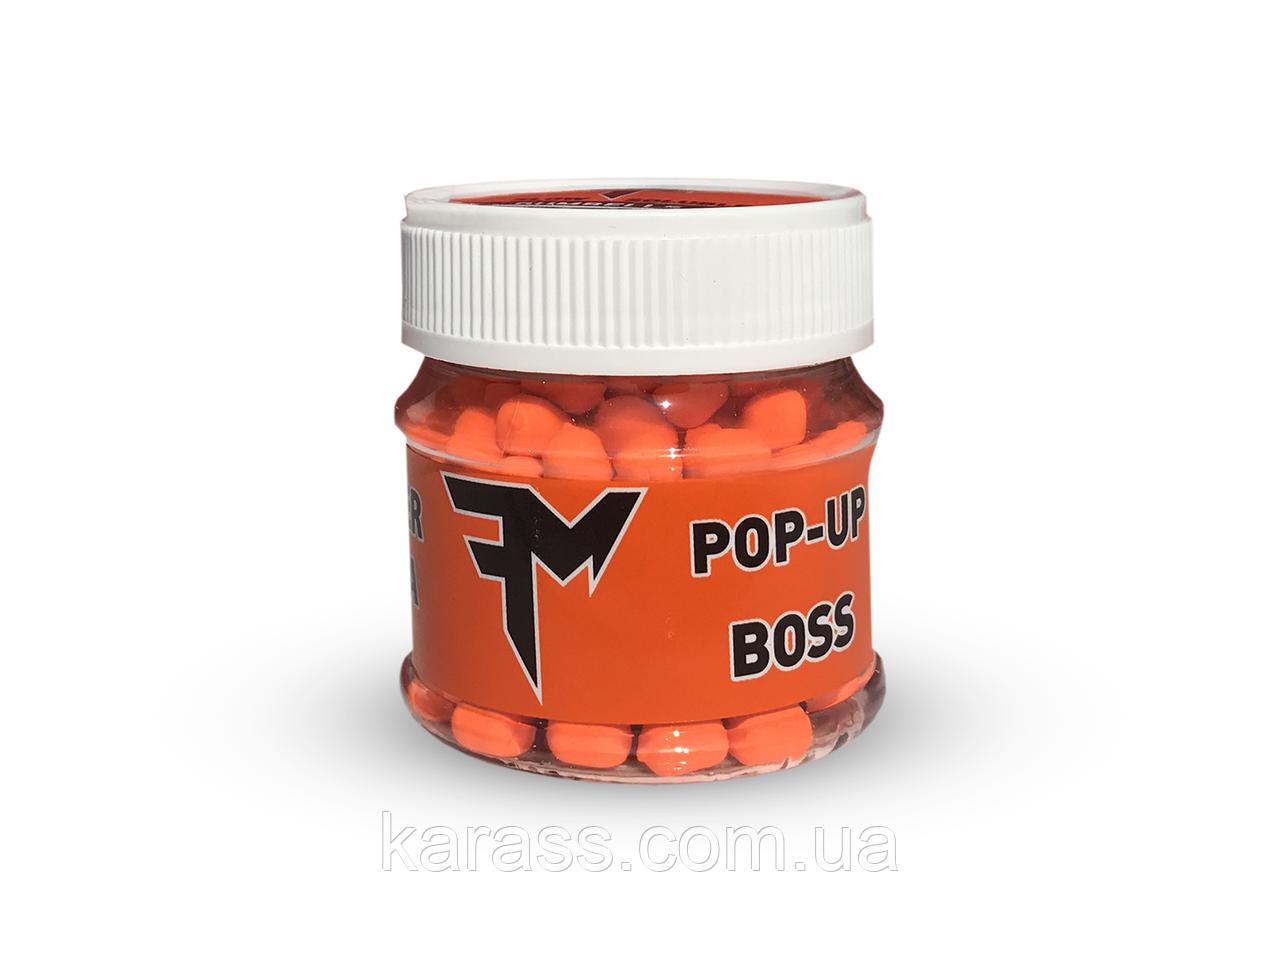 FEEDERMANIA POP-UP DUMBELLS 10mm BOSS, фото 1